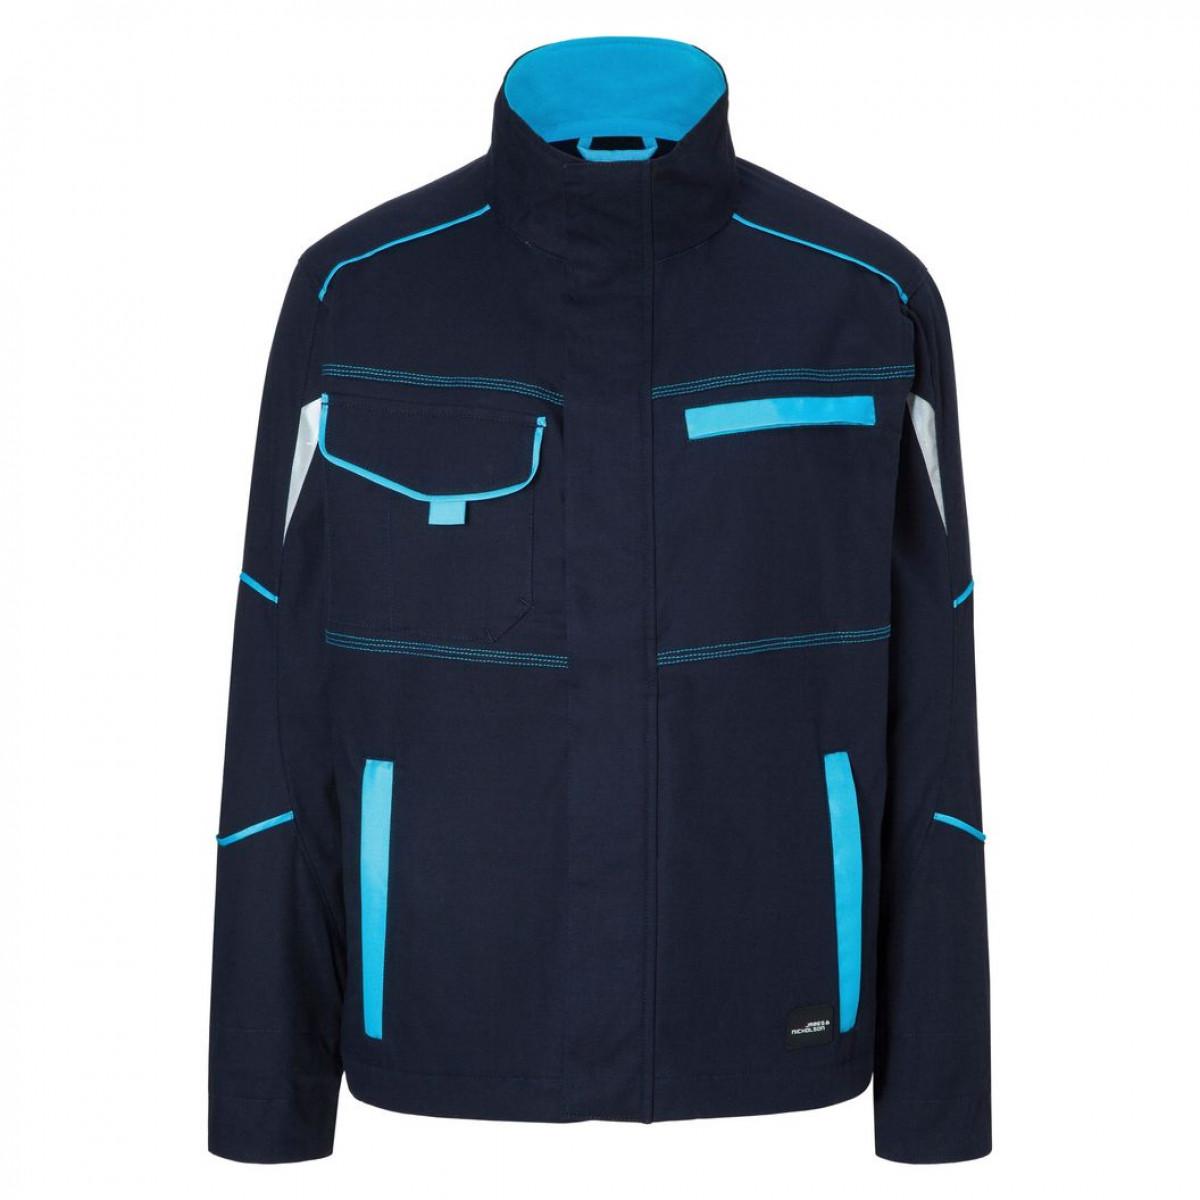 Куртка мужская JN849 Workwear Jacket - Темно-синий/Бирюзовый